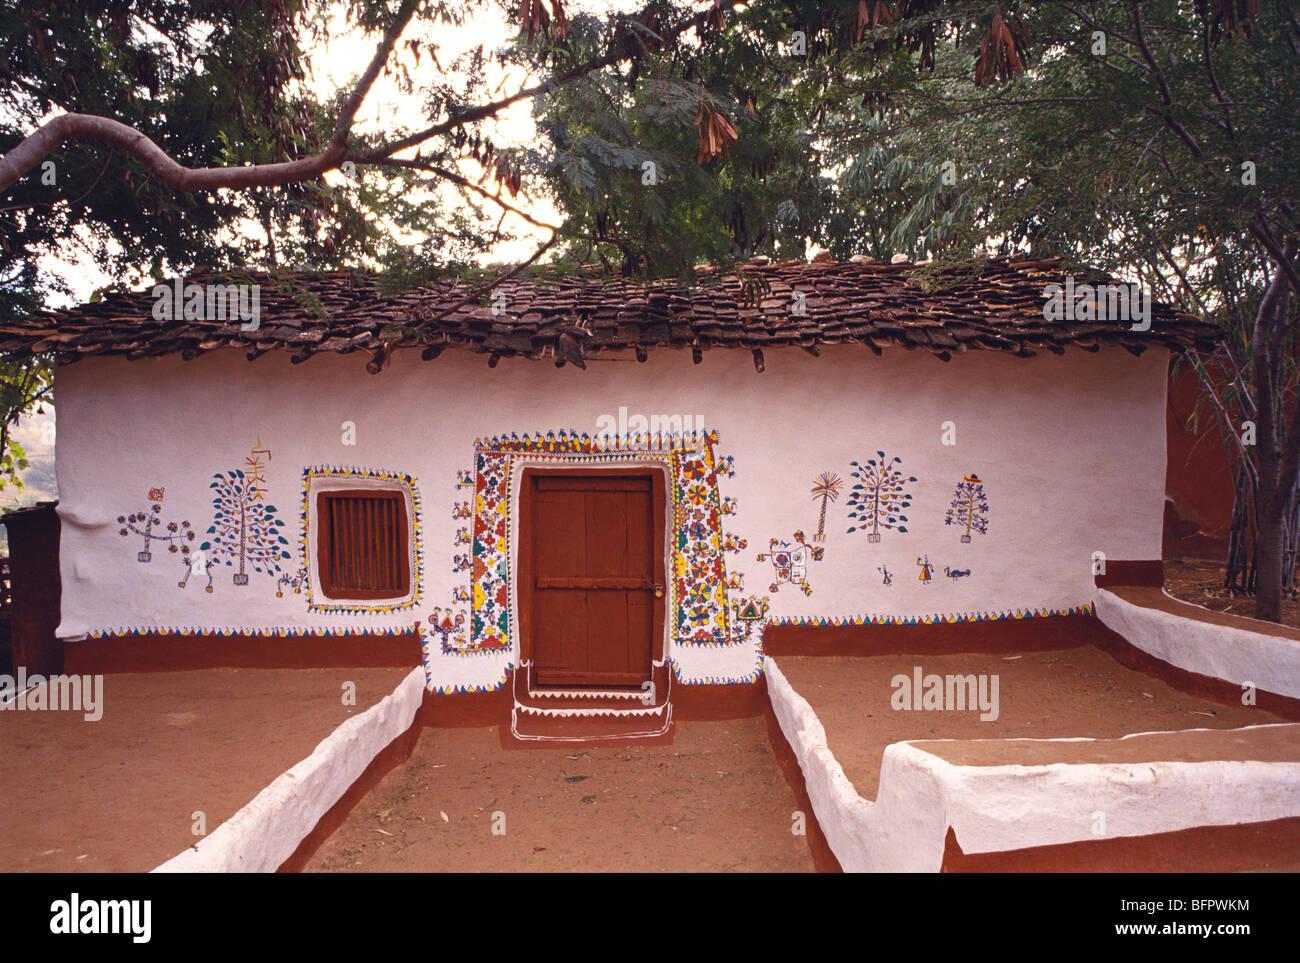 Aad 66504 Wall Painting Sehariya Tribe House Kota